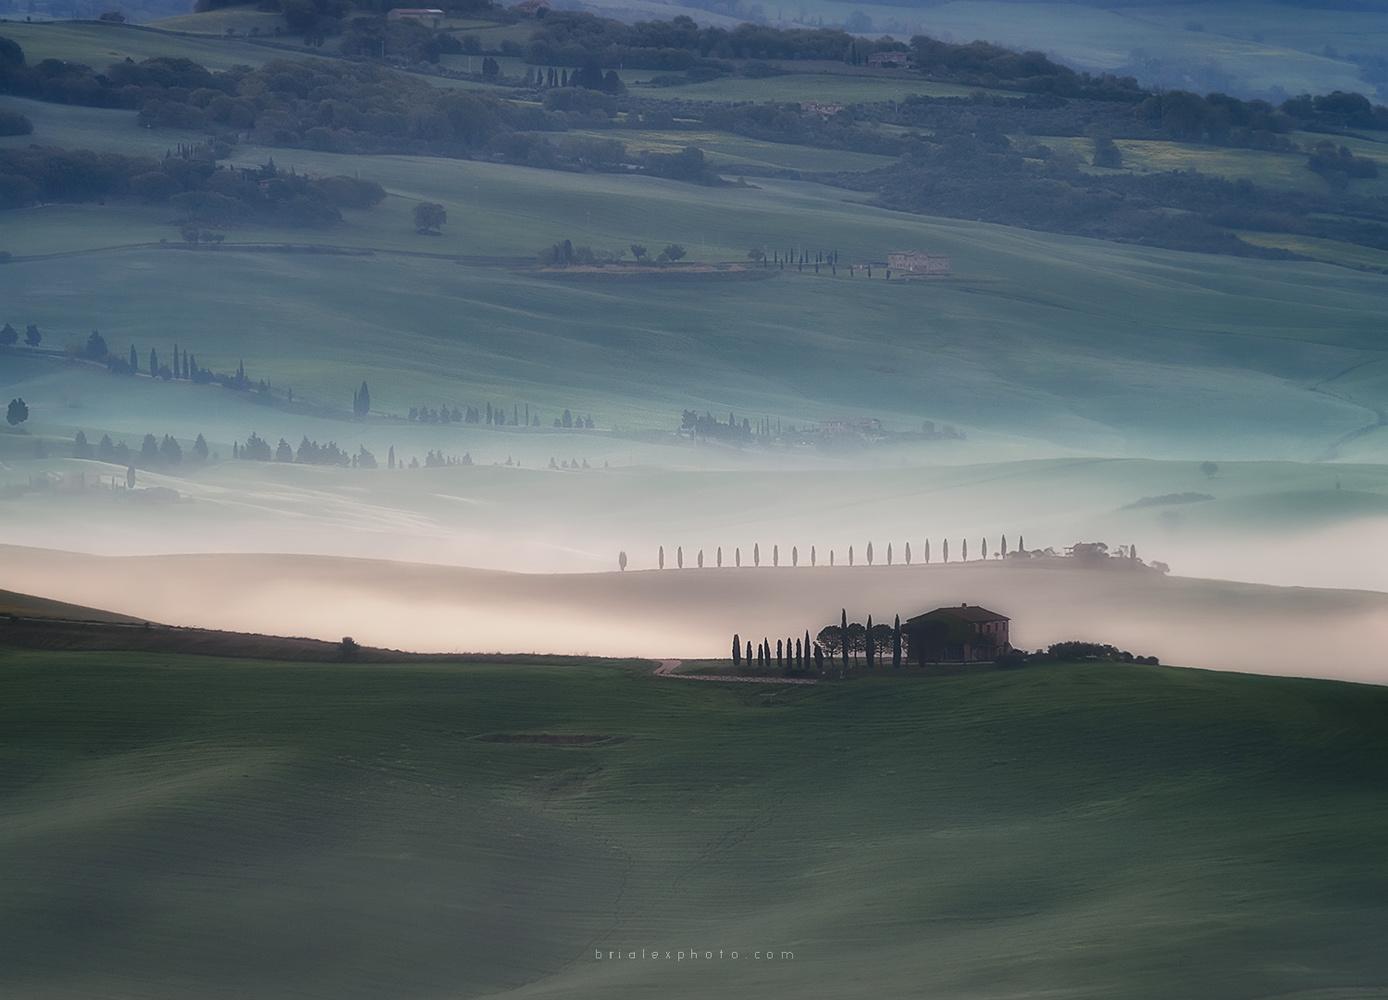 Tuscany at dawn by Brighilă Alex